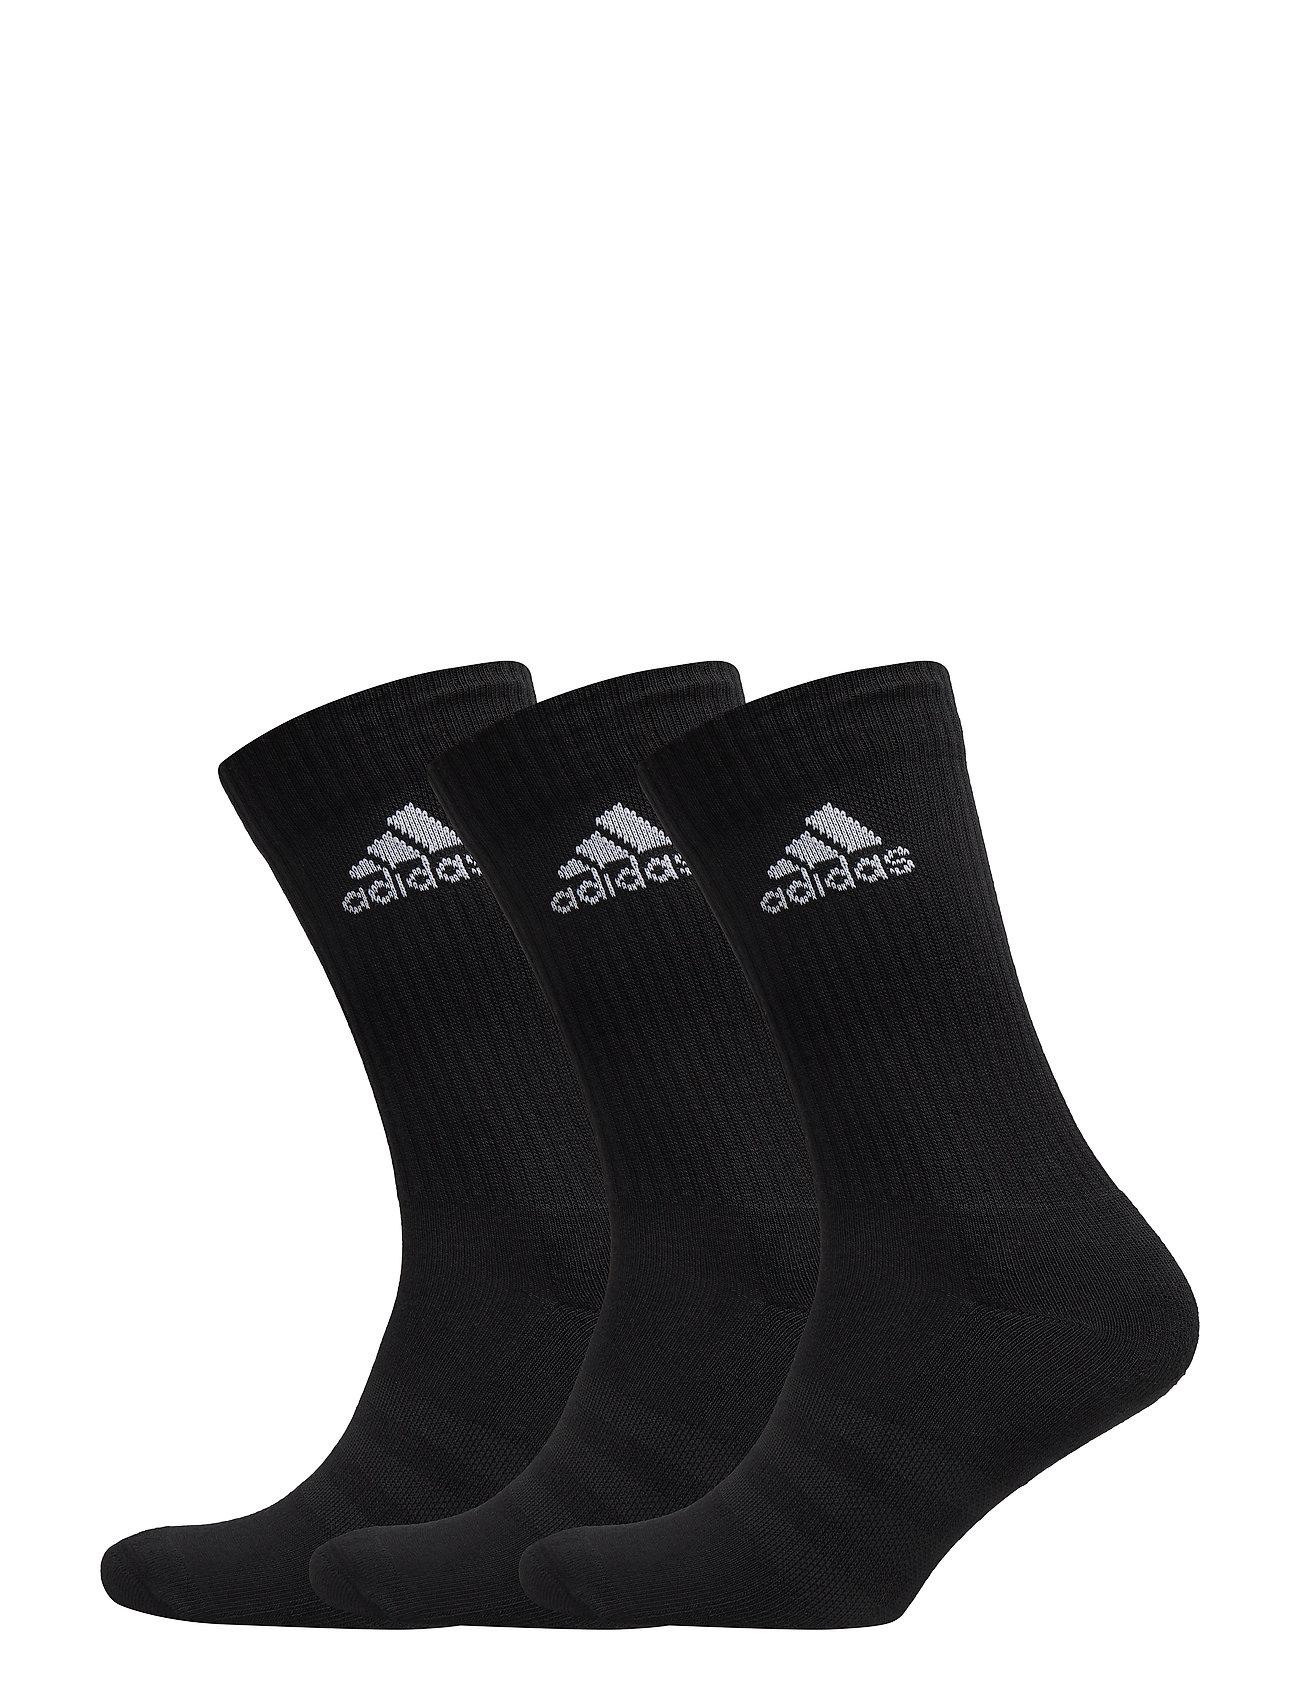 adidas Tennis 3-STRIPES PERFORMANCE CREW SOCKS 3-PACK - BLACK